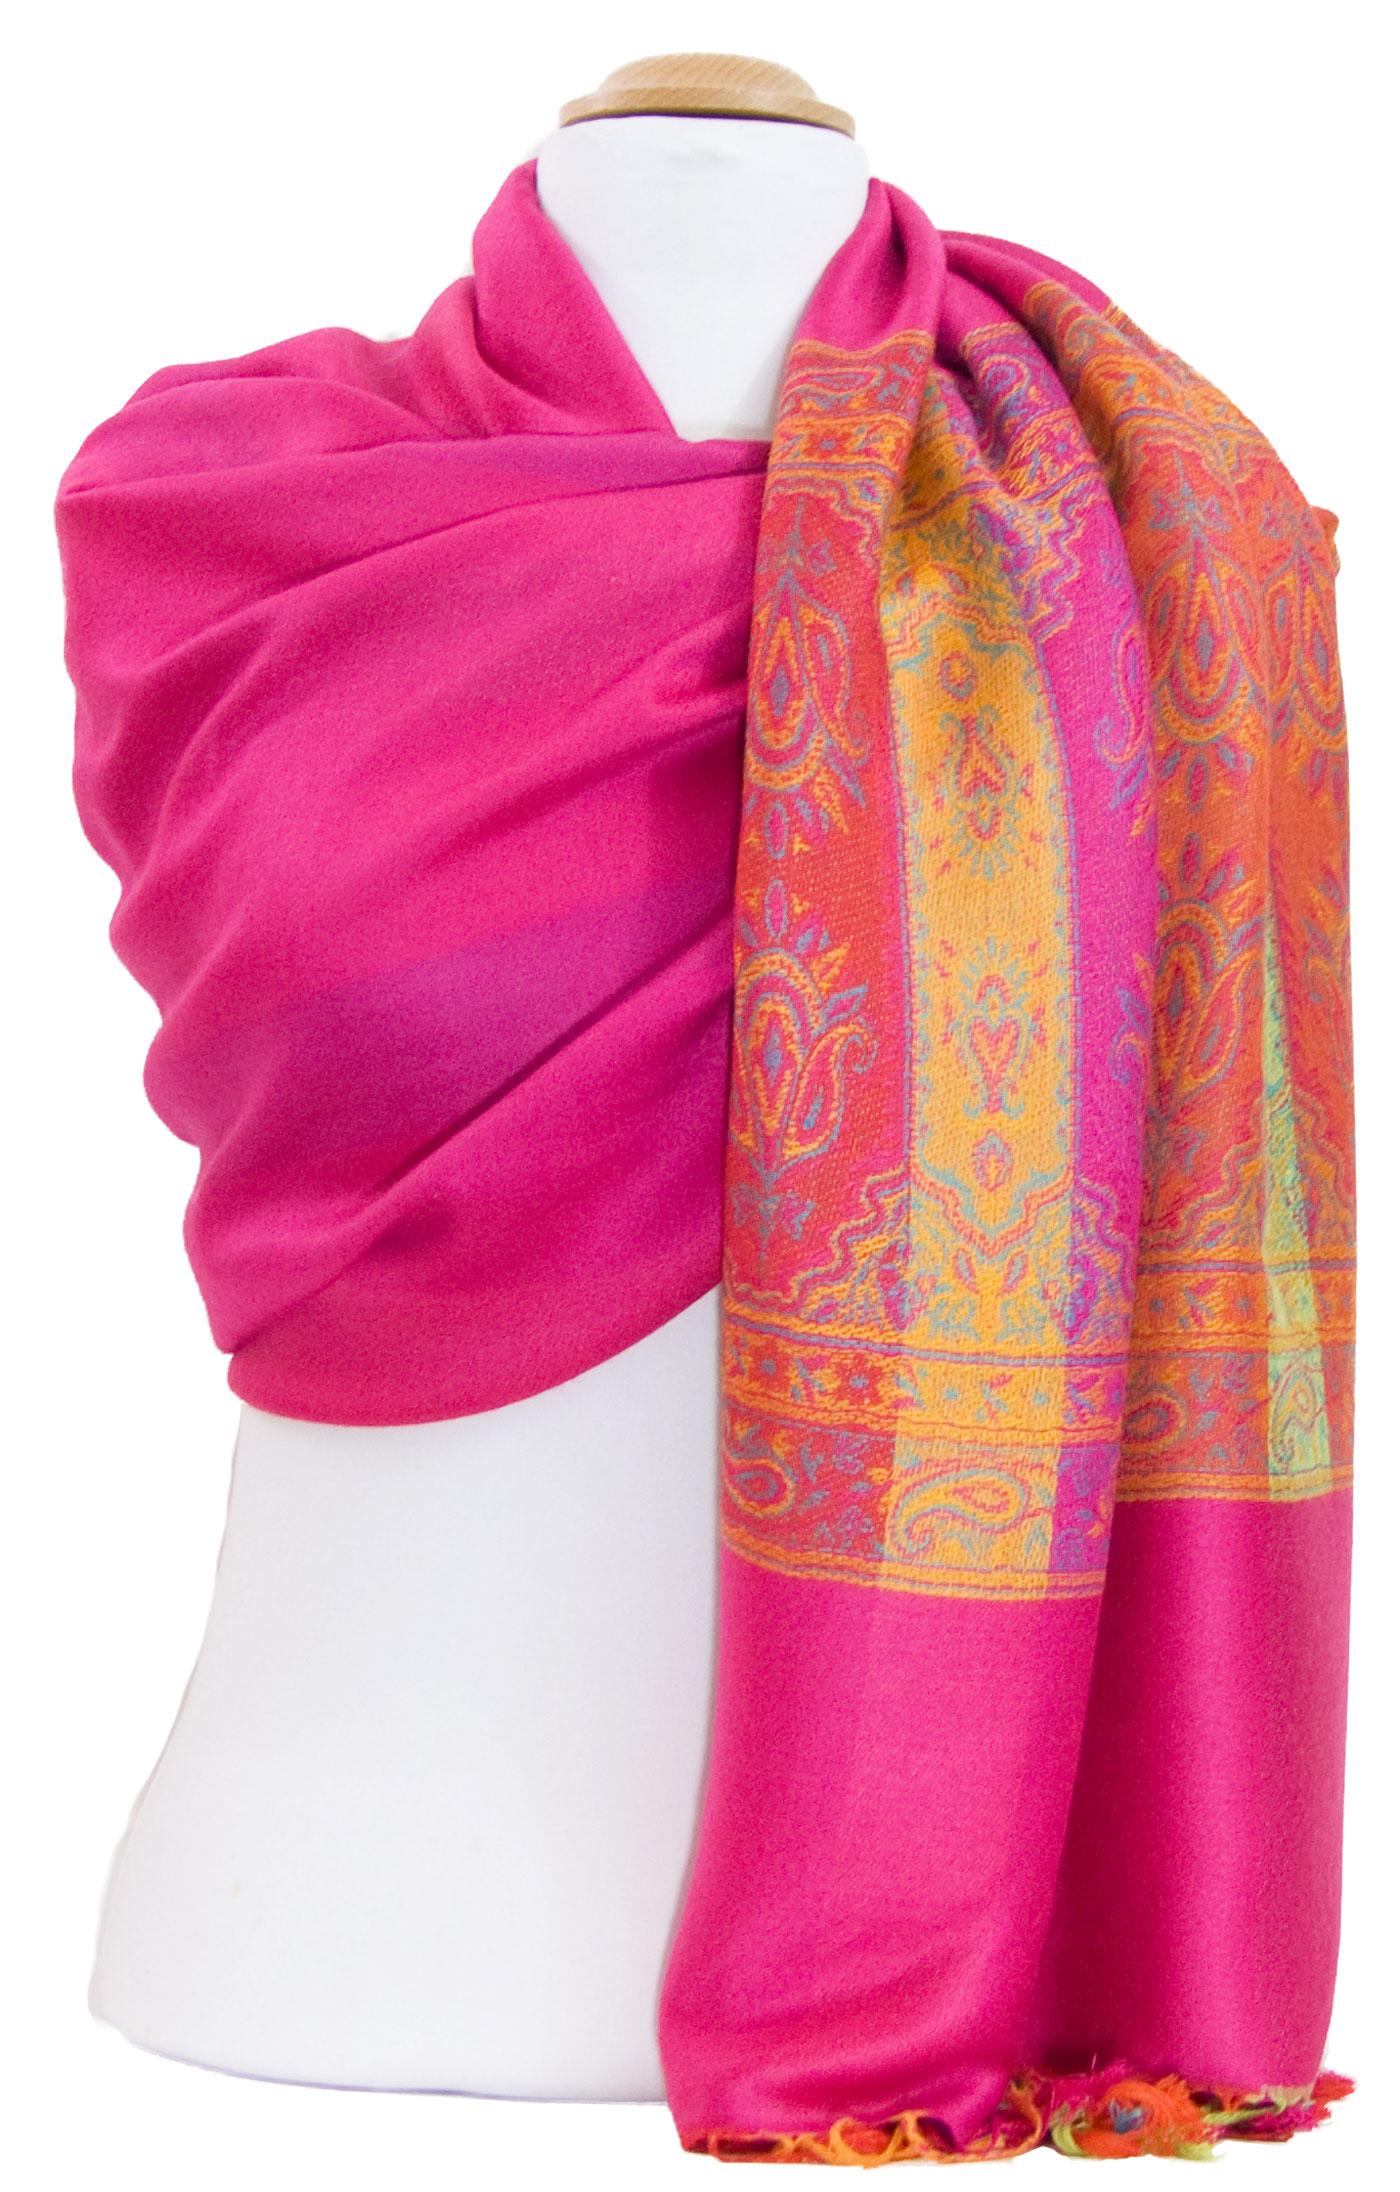 Etole pashmina rose fushia tissage multicolore